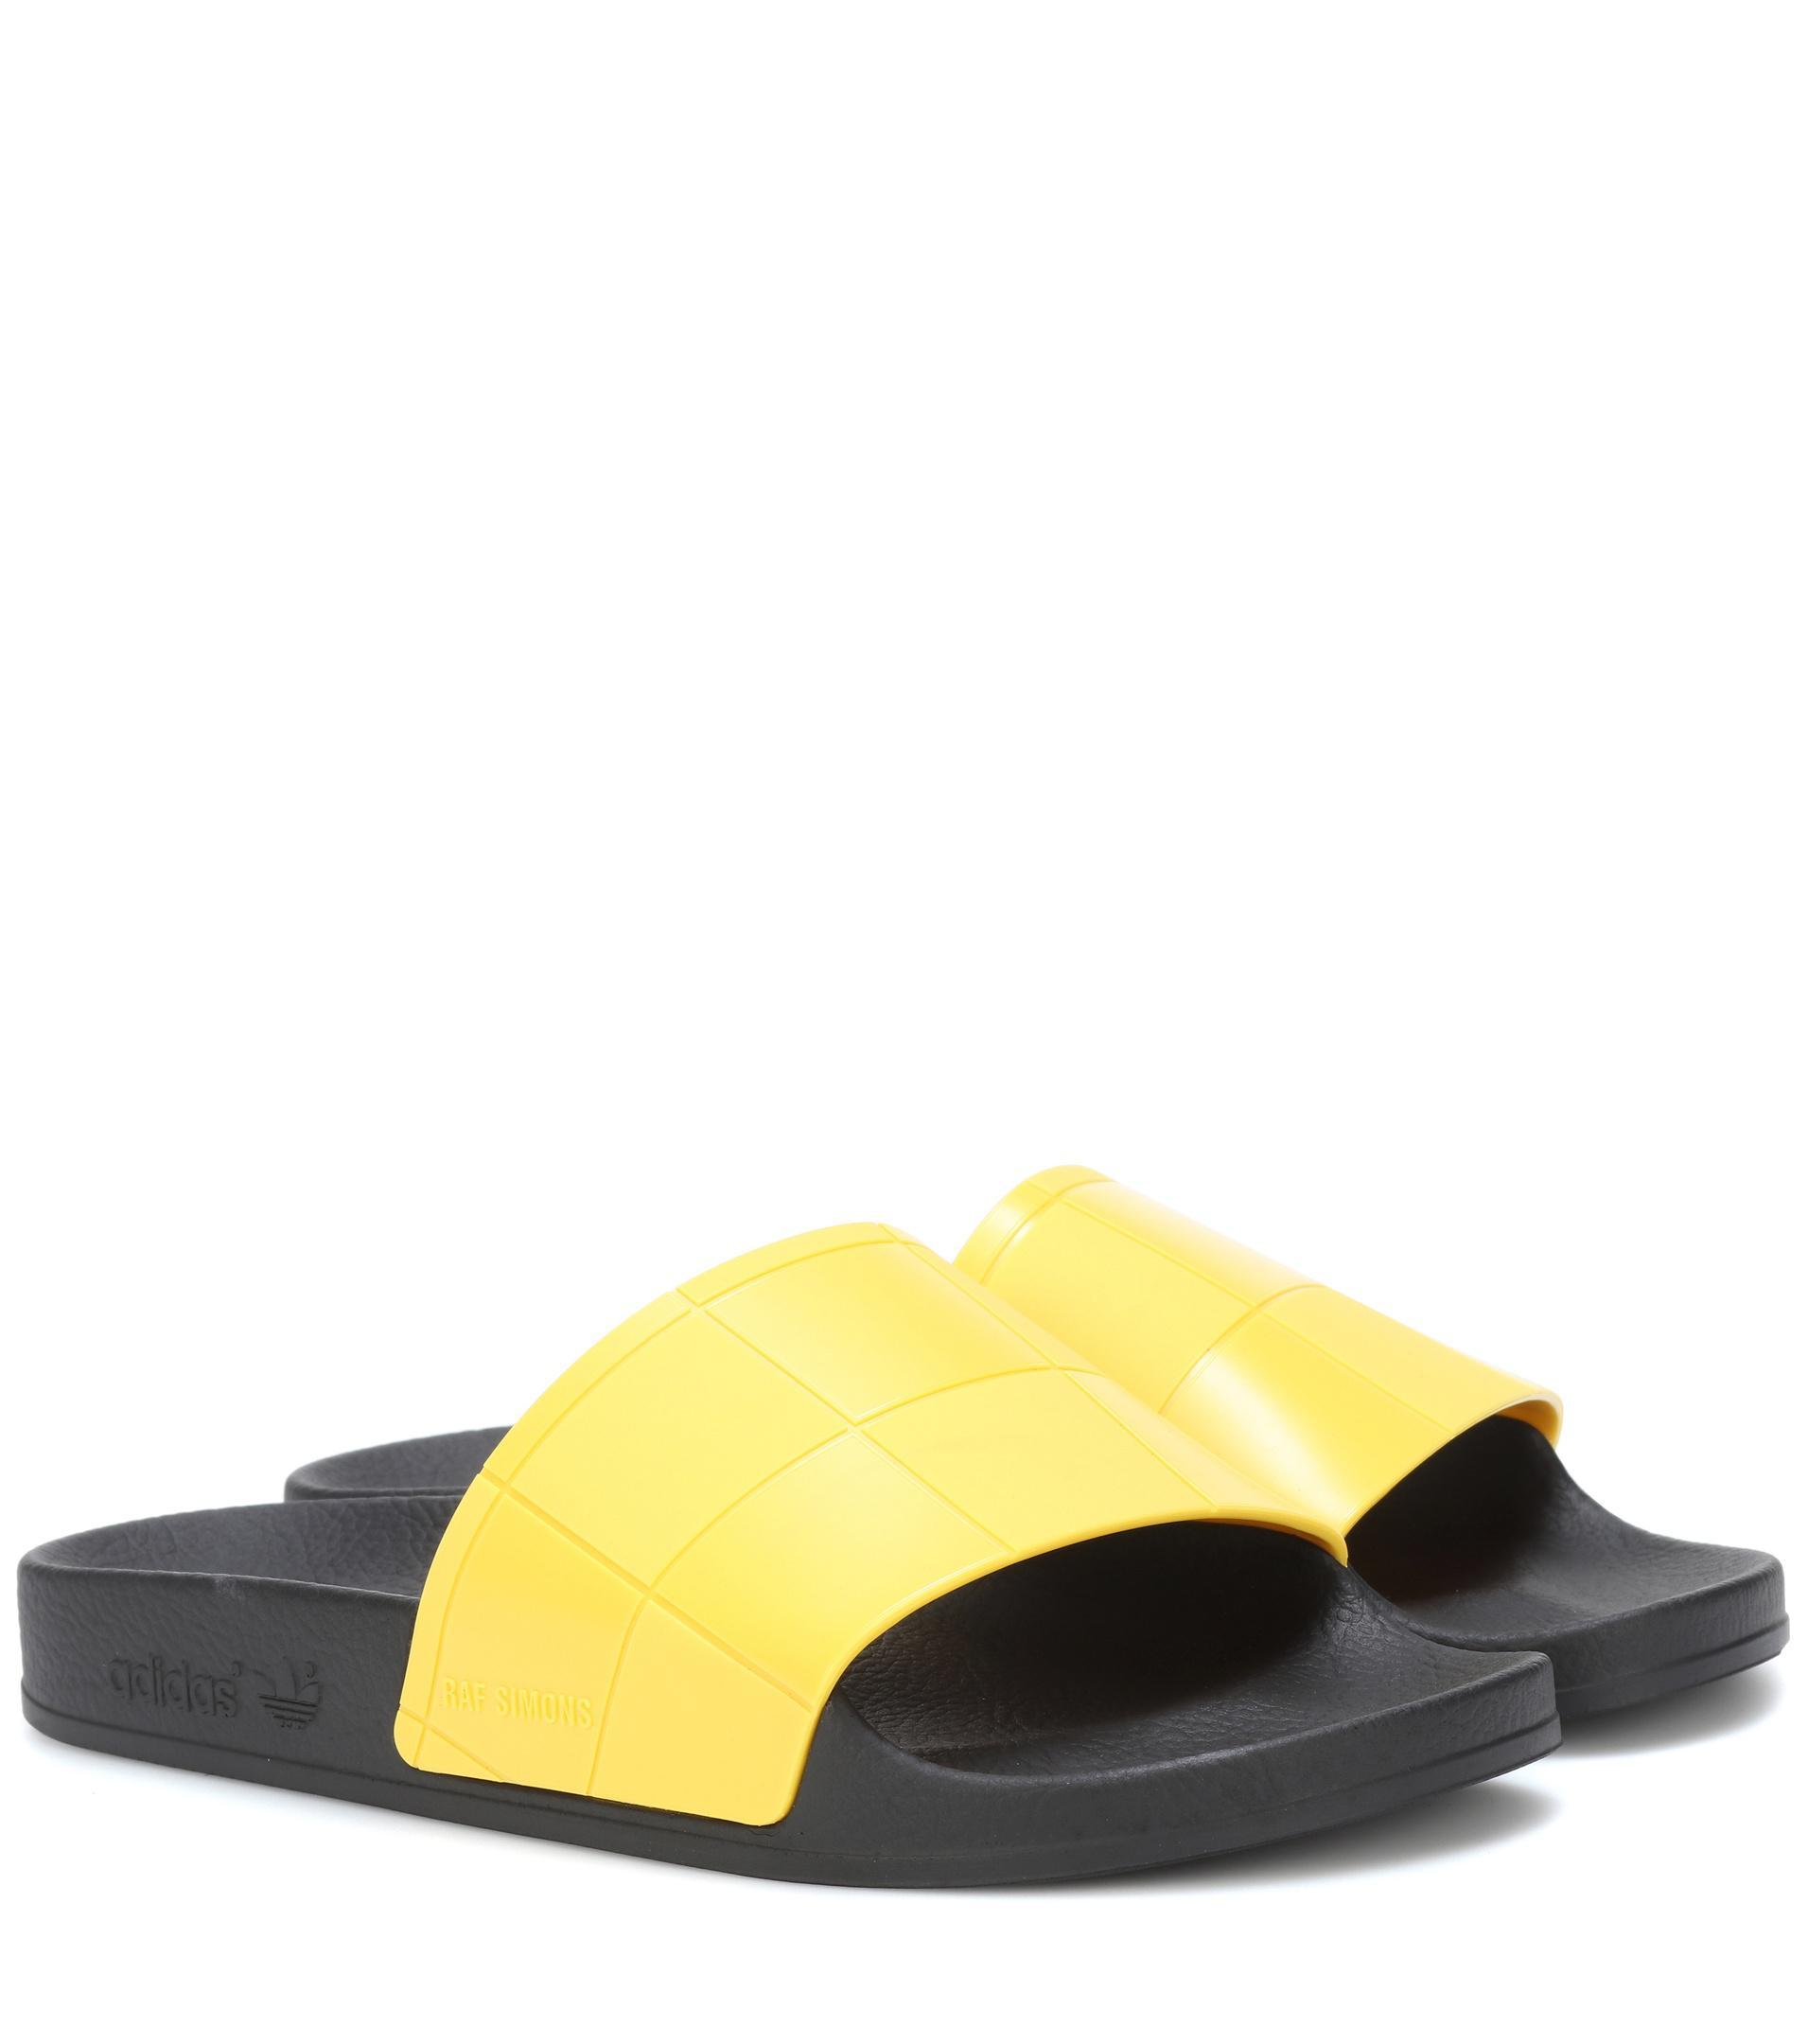 aa28db983a636 Lyst - adidas By Raf Simons Adilette Checkerboard Slides in Yellow